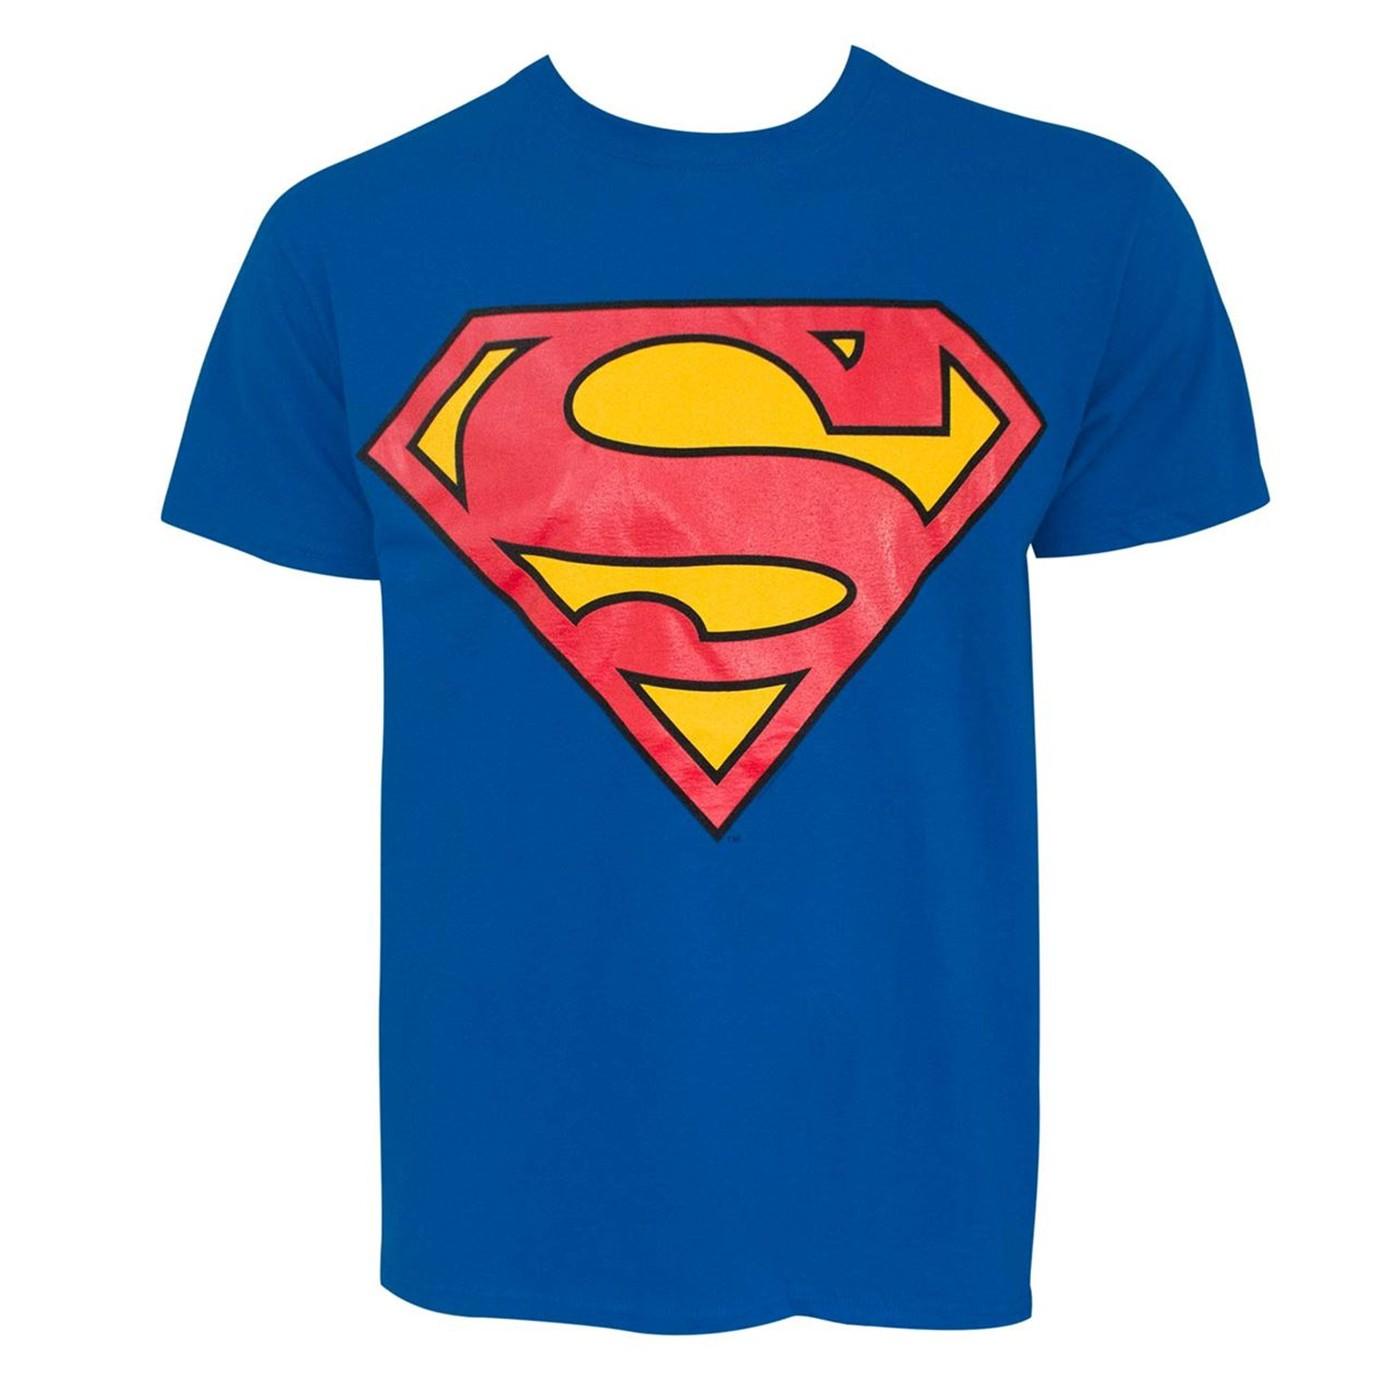 Superman Glow-in-the-Dark Symbol Men's T-Shirt